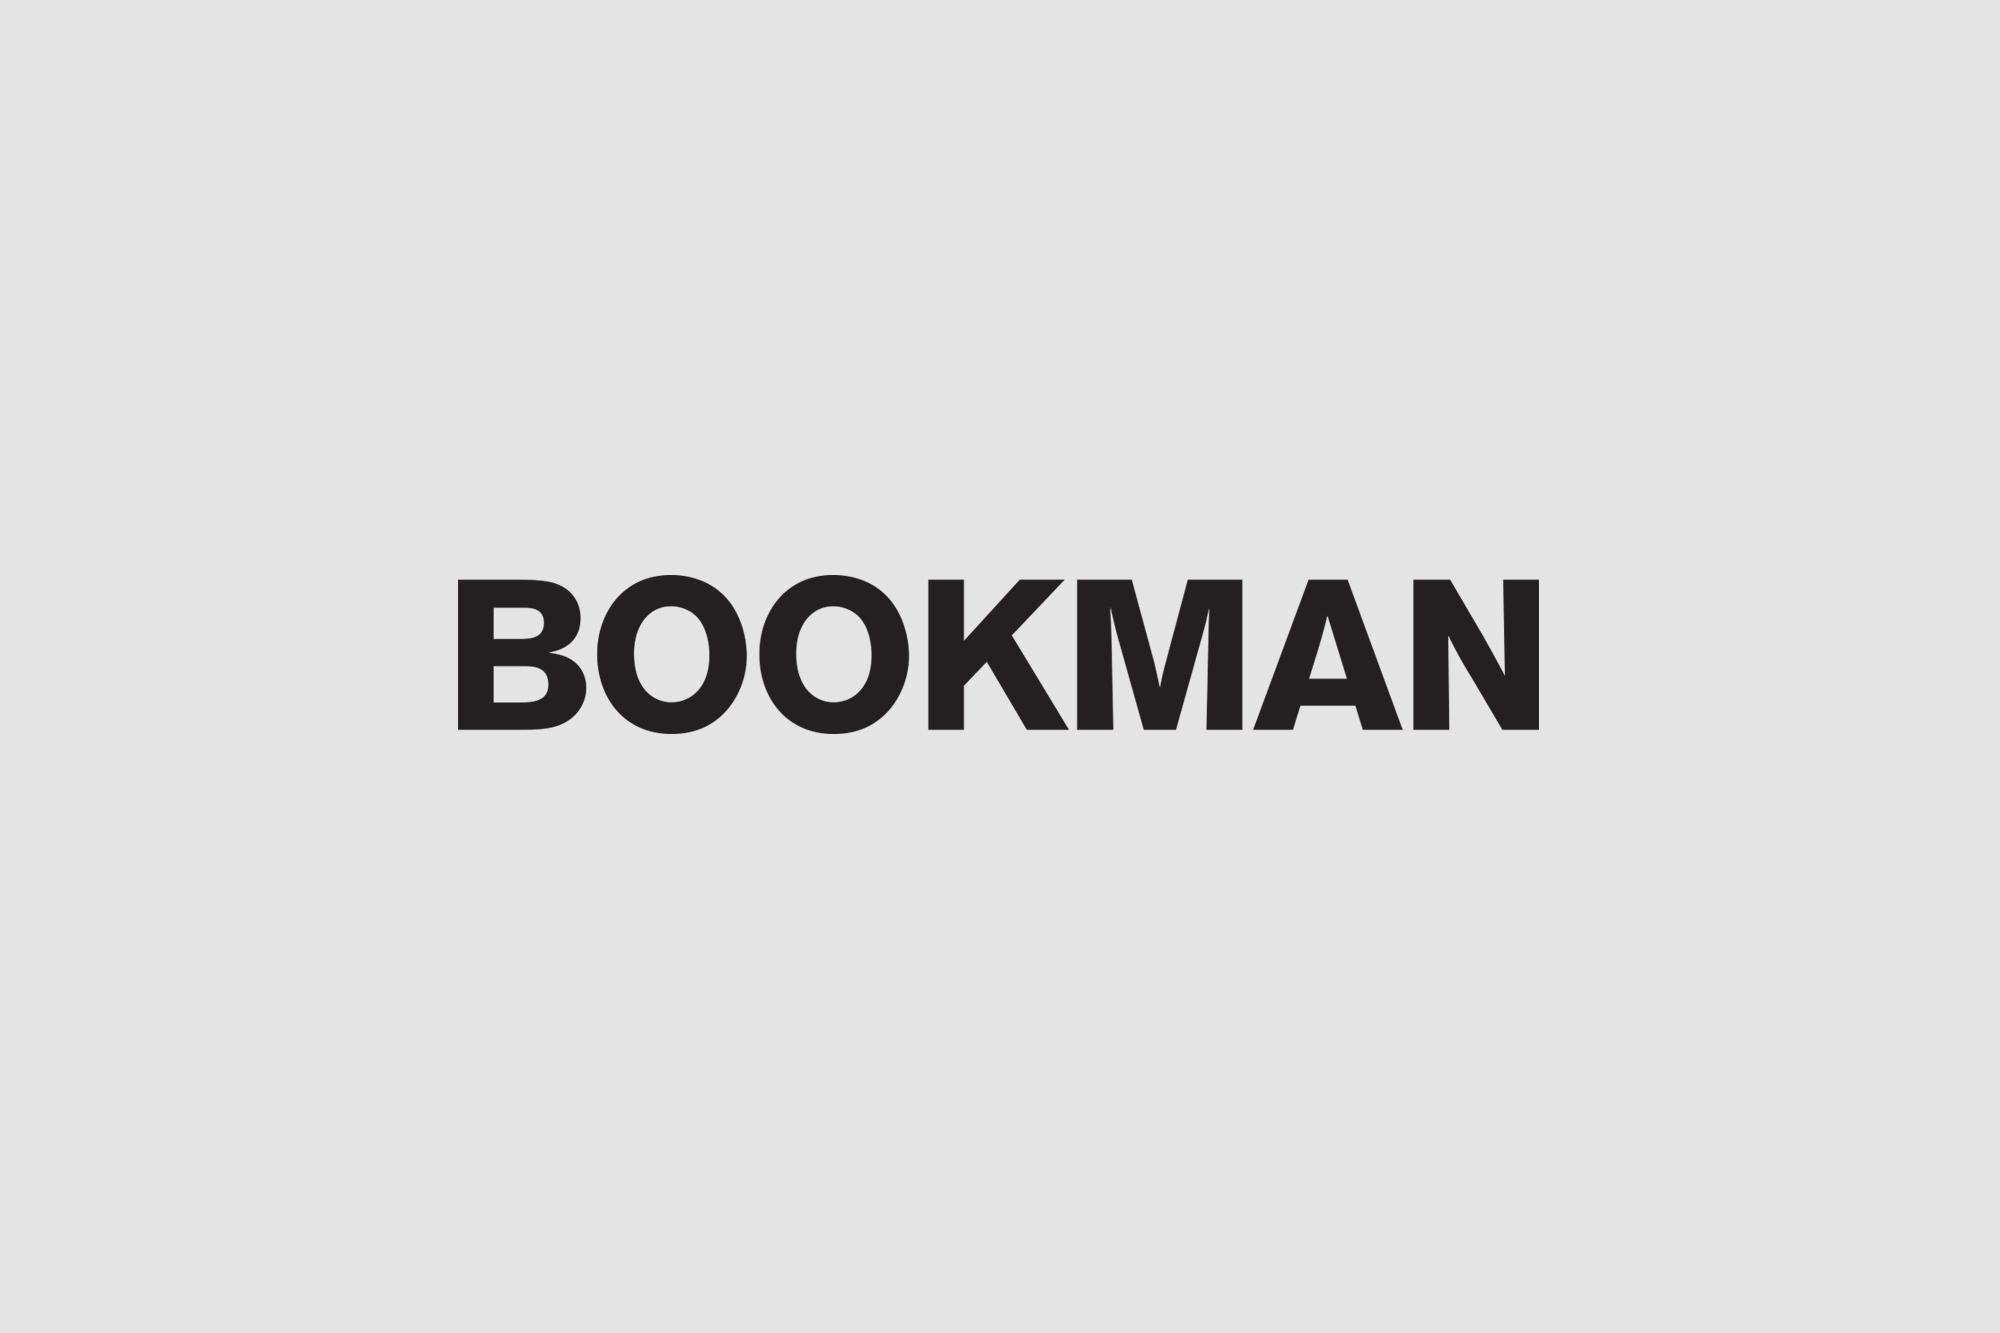 bookmanlogo2.jpg